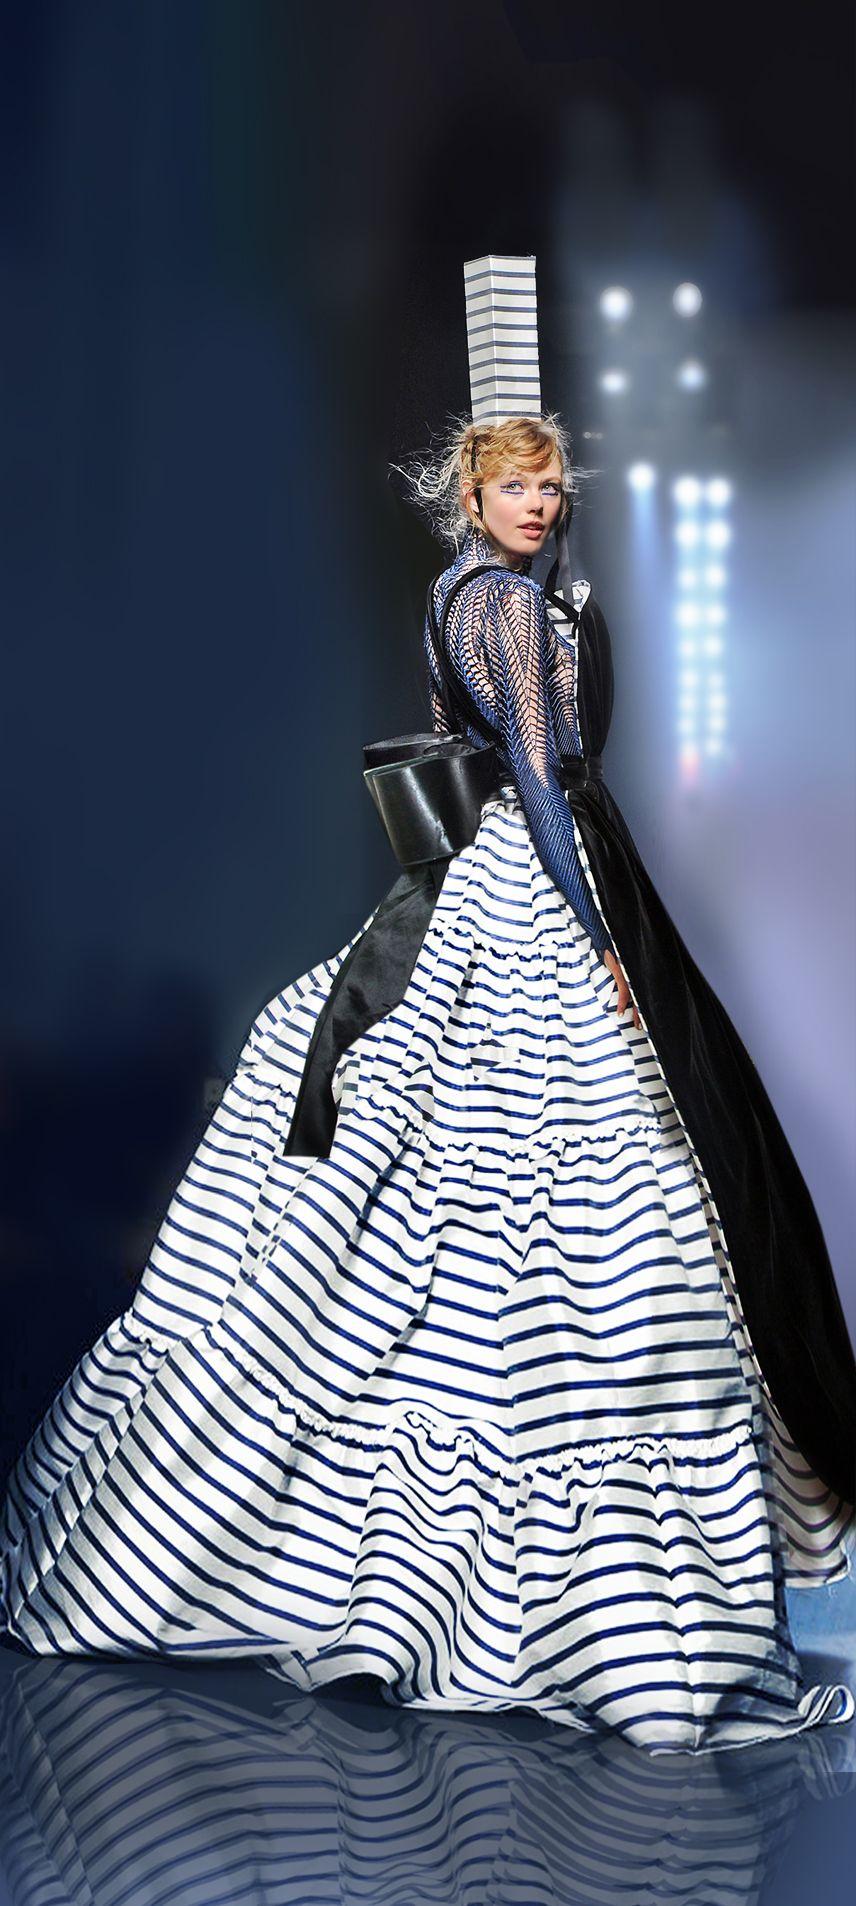 mquesadad | Fashion, Couture fashion, Jean